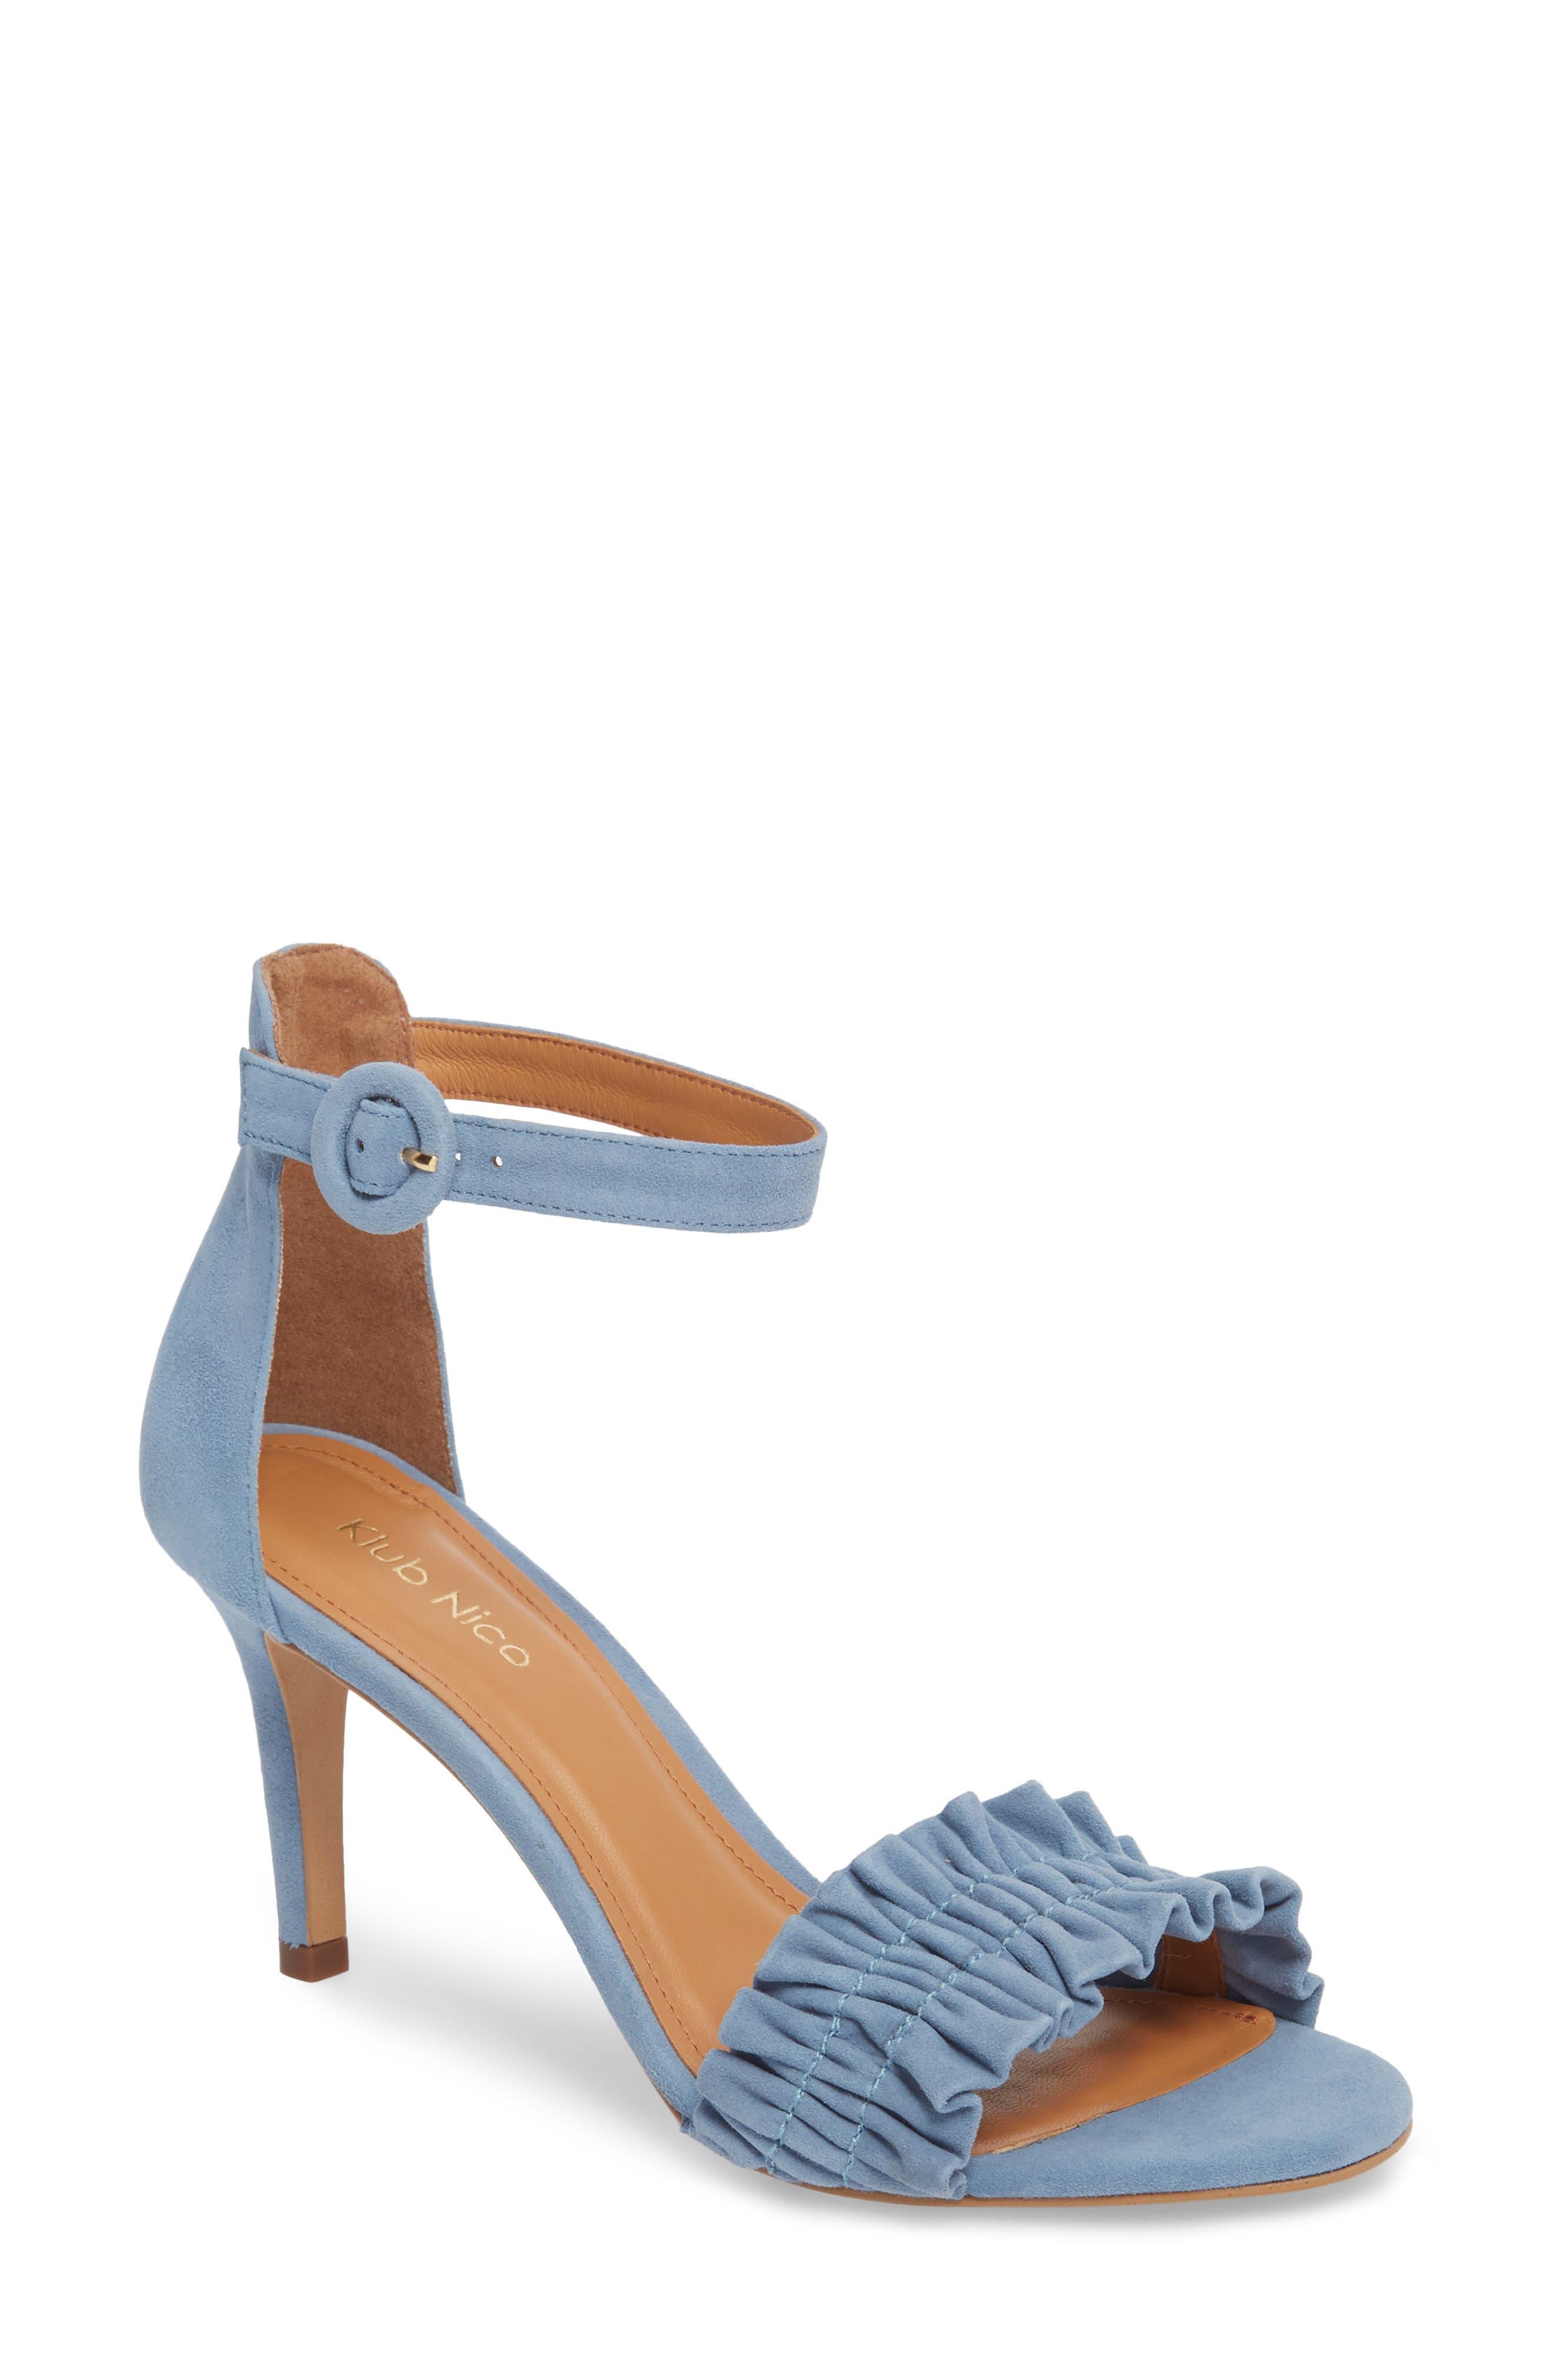 Arlow Sandal,                             Main thumbnail 1, color,                             BLUE LEATHER